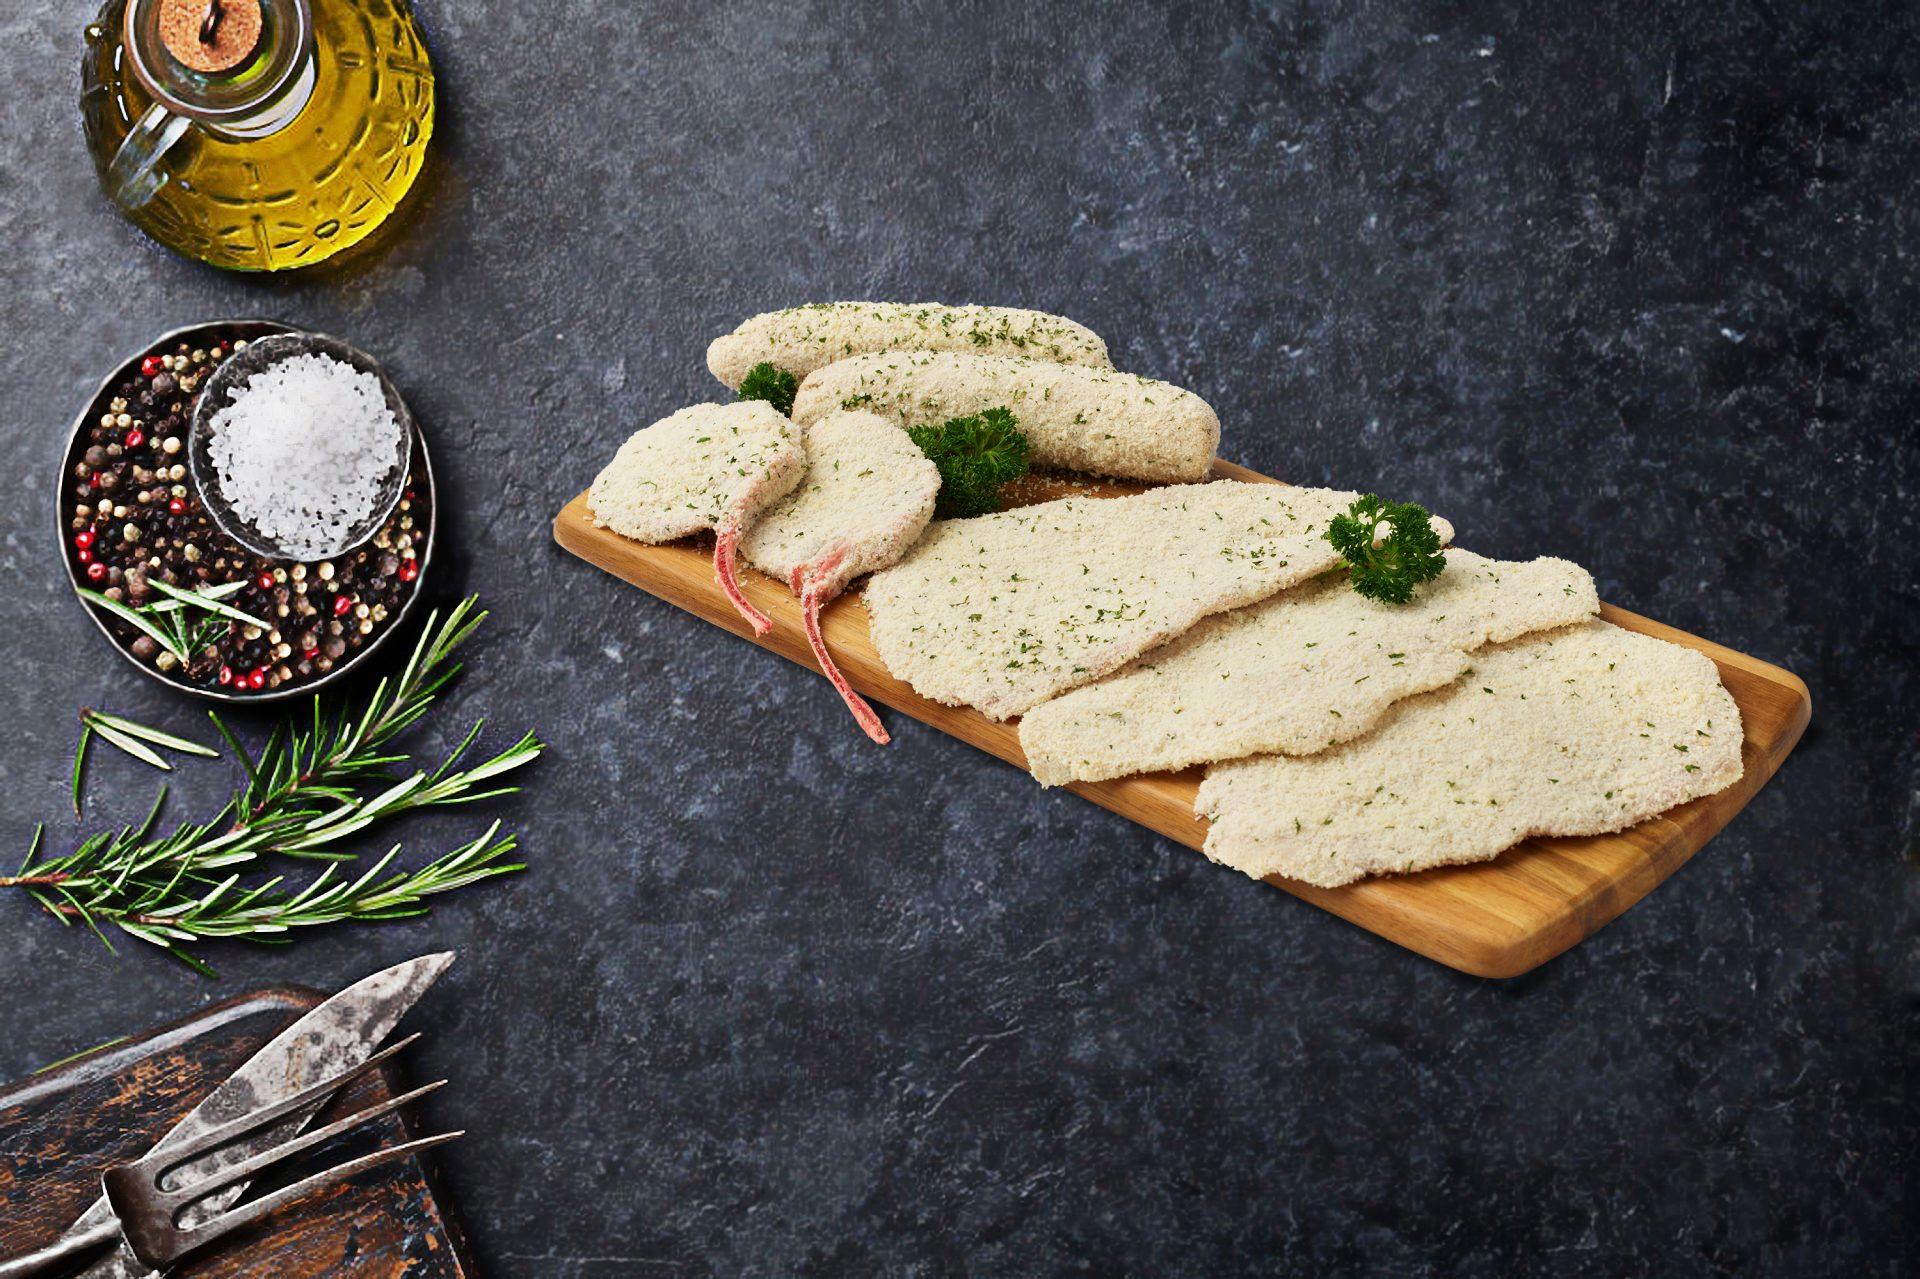 crumbed french lamb cutlets, crumbed sausages, veal schnitzel, chicken schnitzel, pork schnitzel